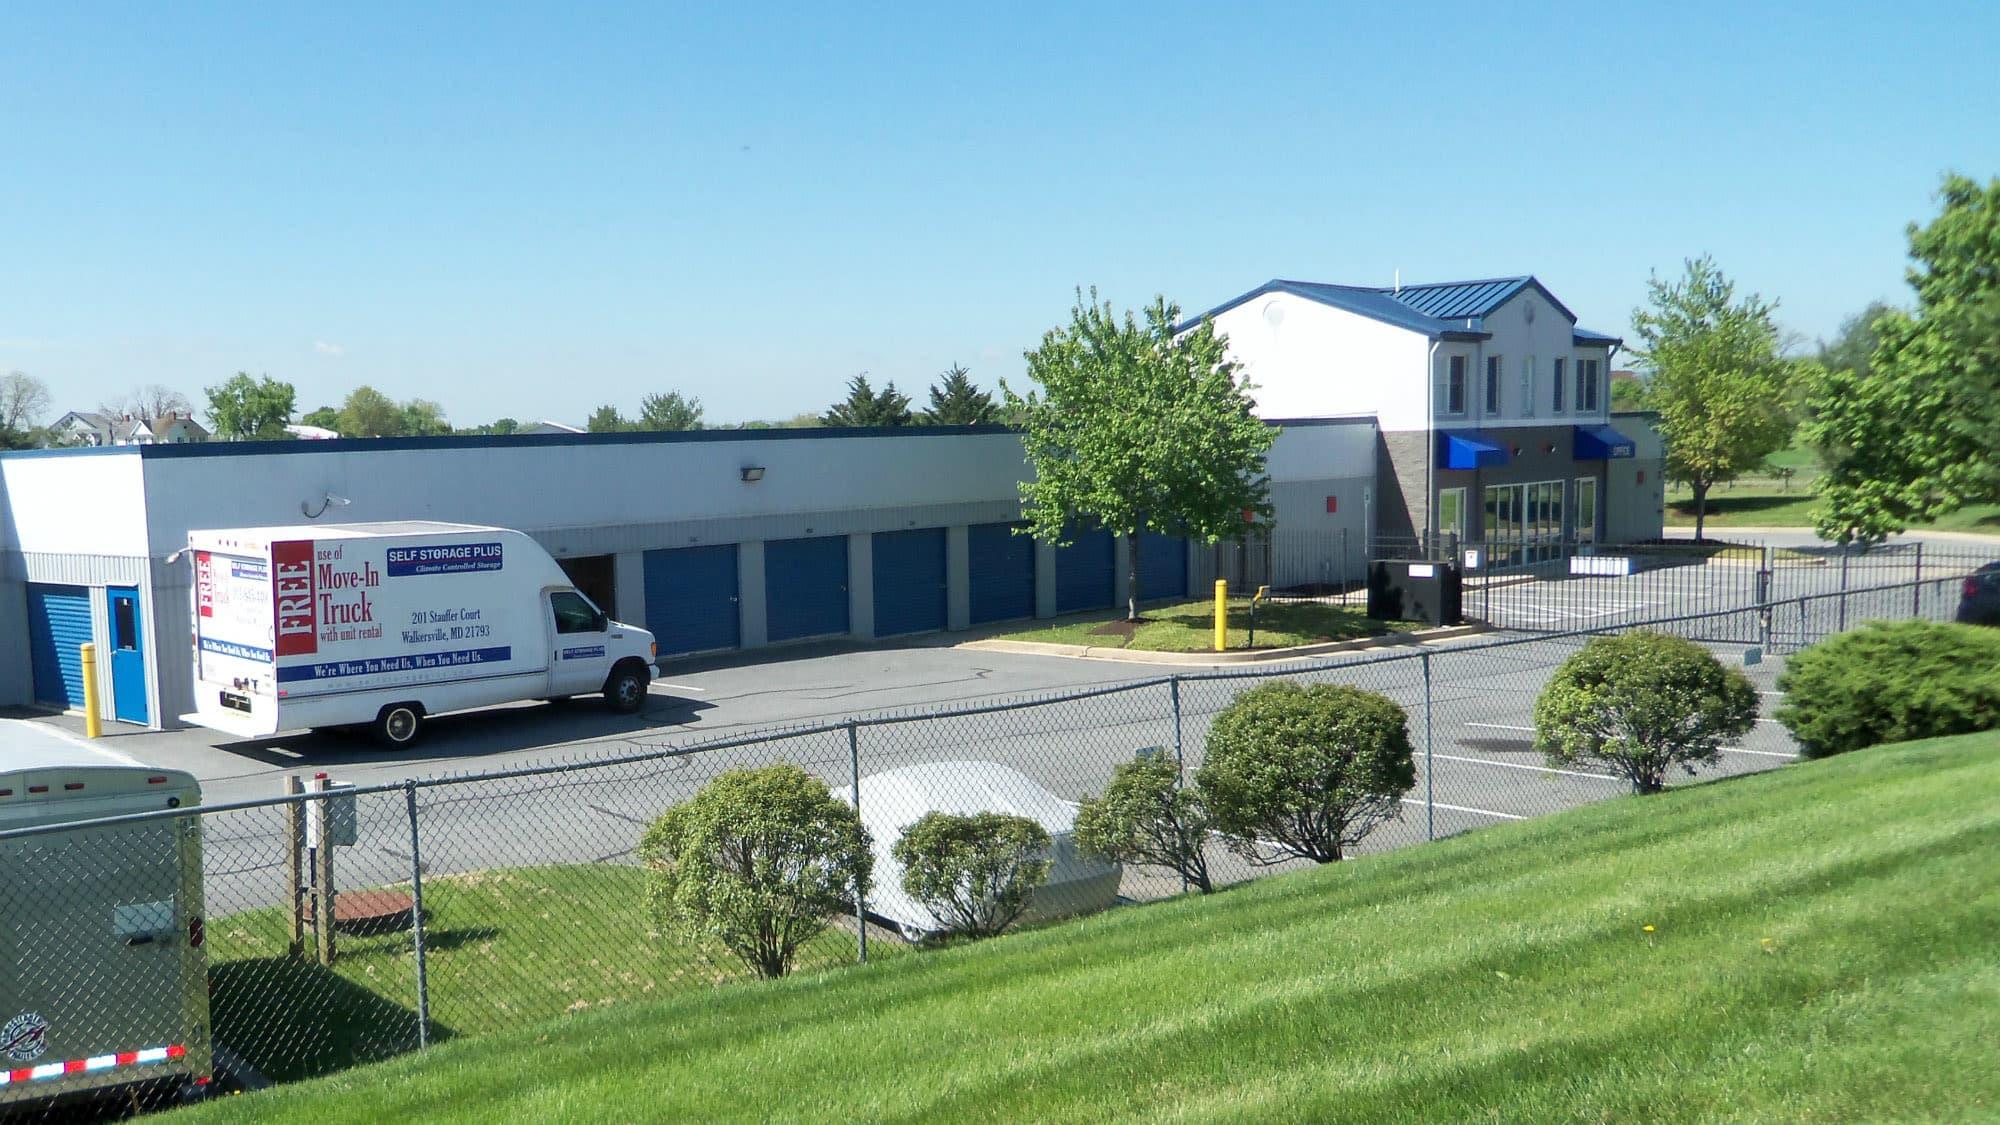 Exterior view of Self Storage Plus in Walkersville, MD